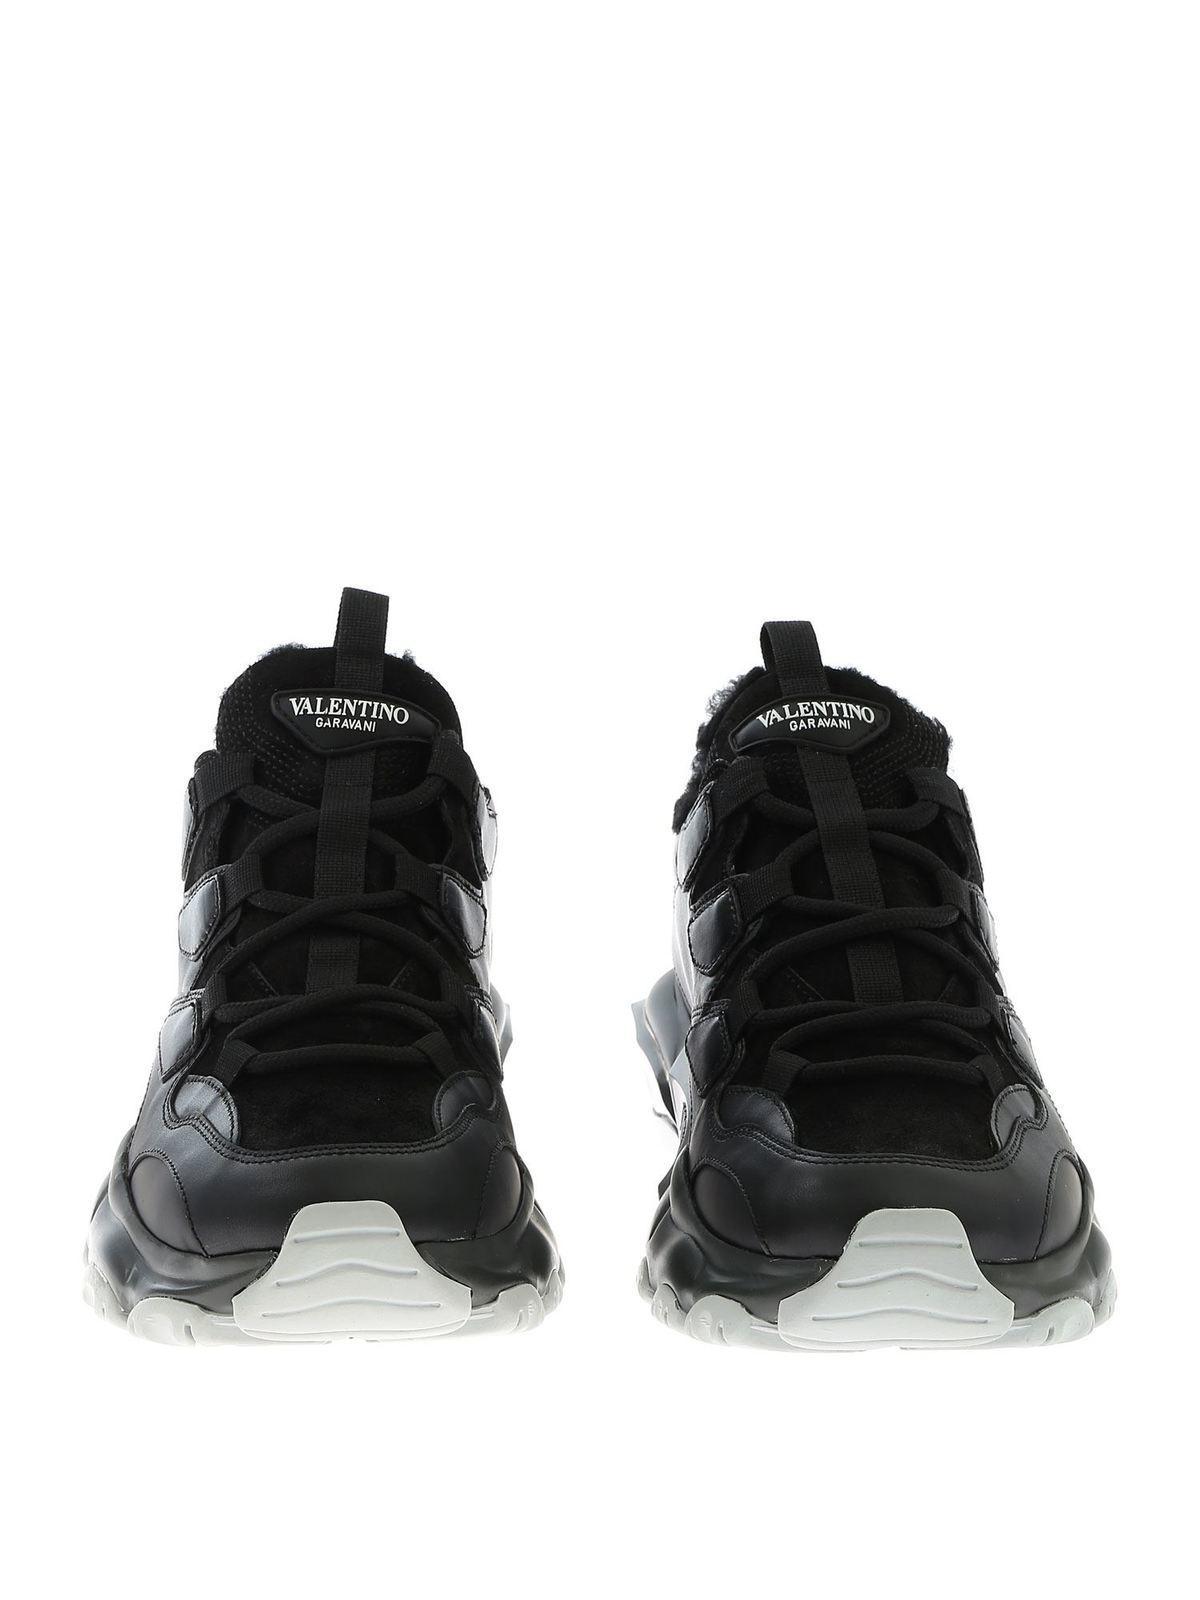 Valentino Garavani - Bounce sneakers in